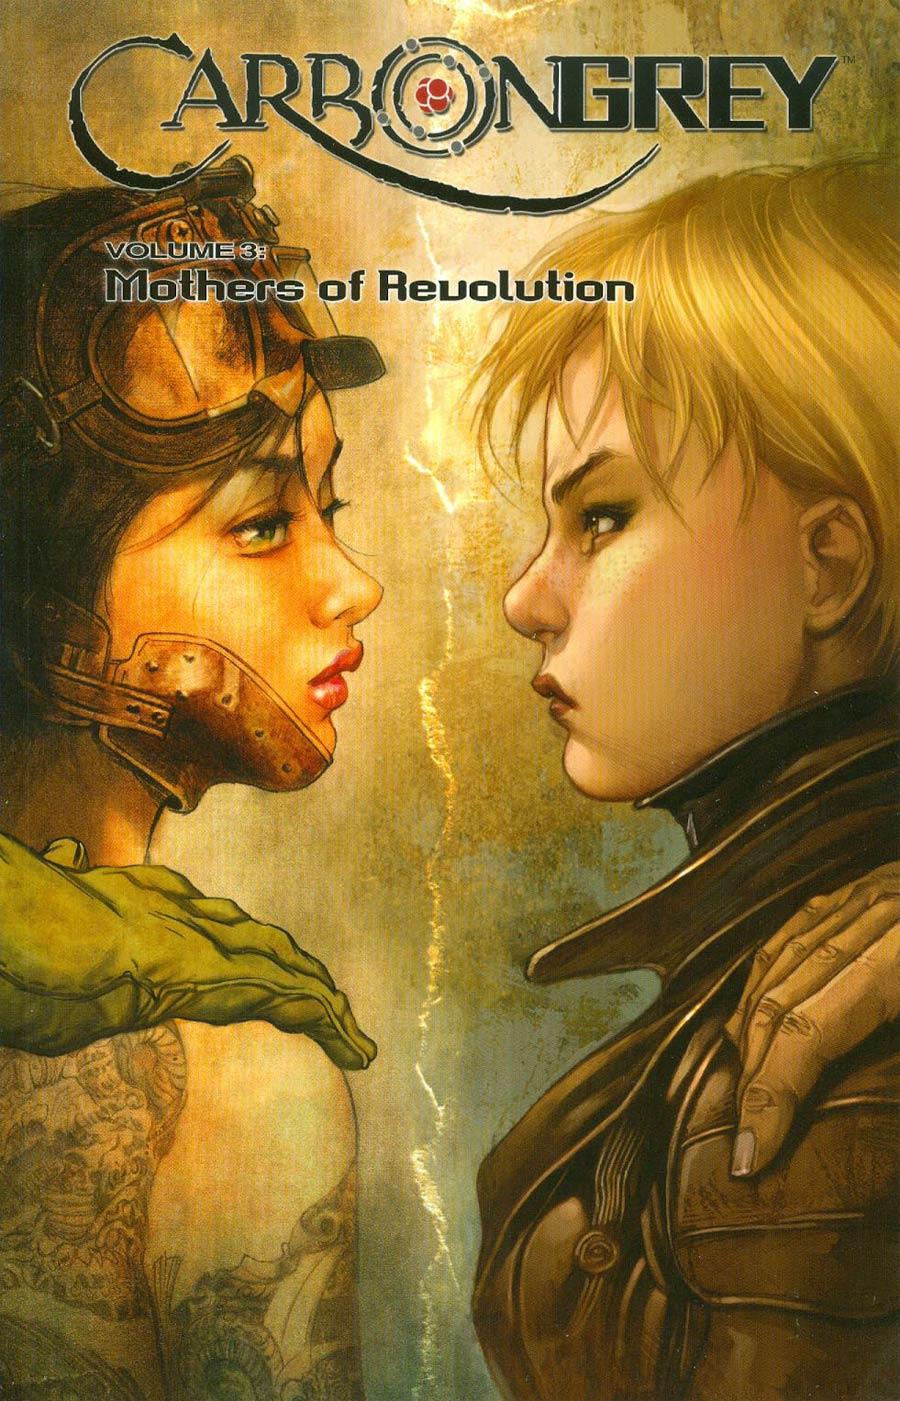 Carbon Grey Vol 3 Mothers Of Revolution TP